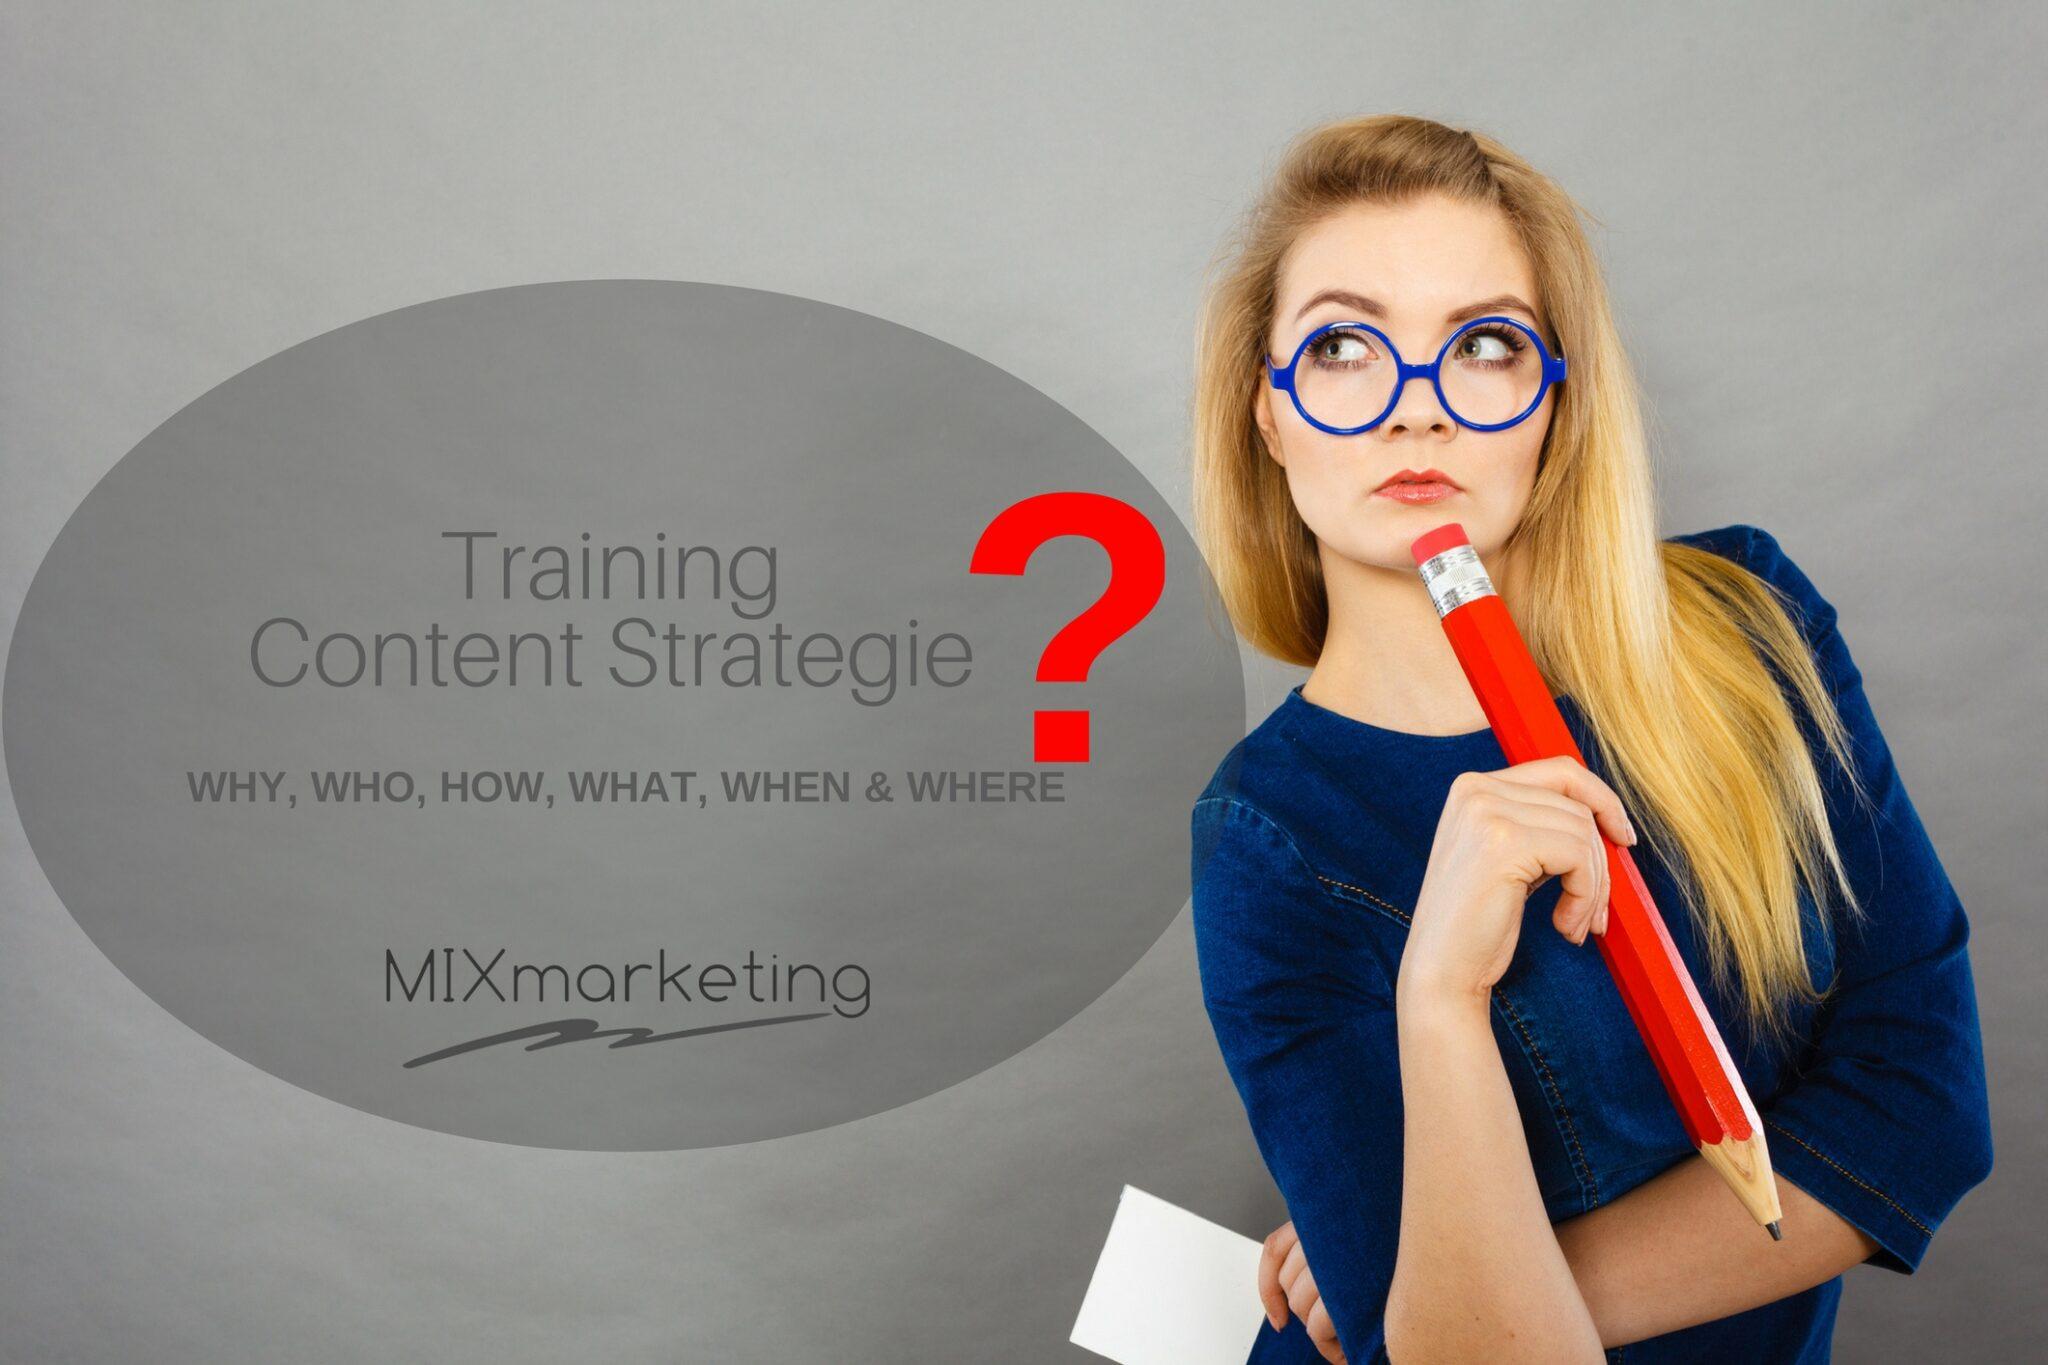 MIXmarketing Content Strategie Training